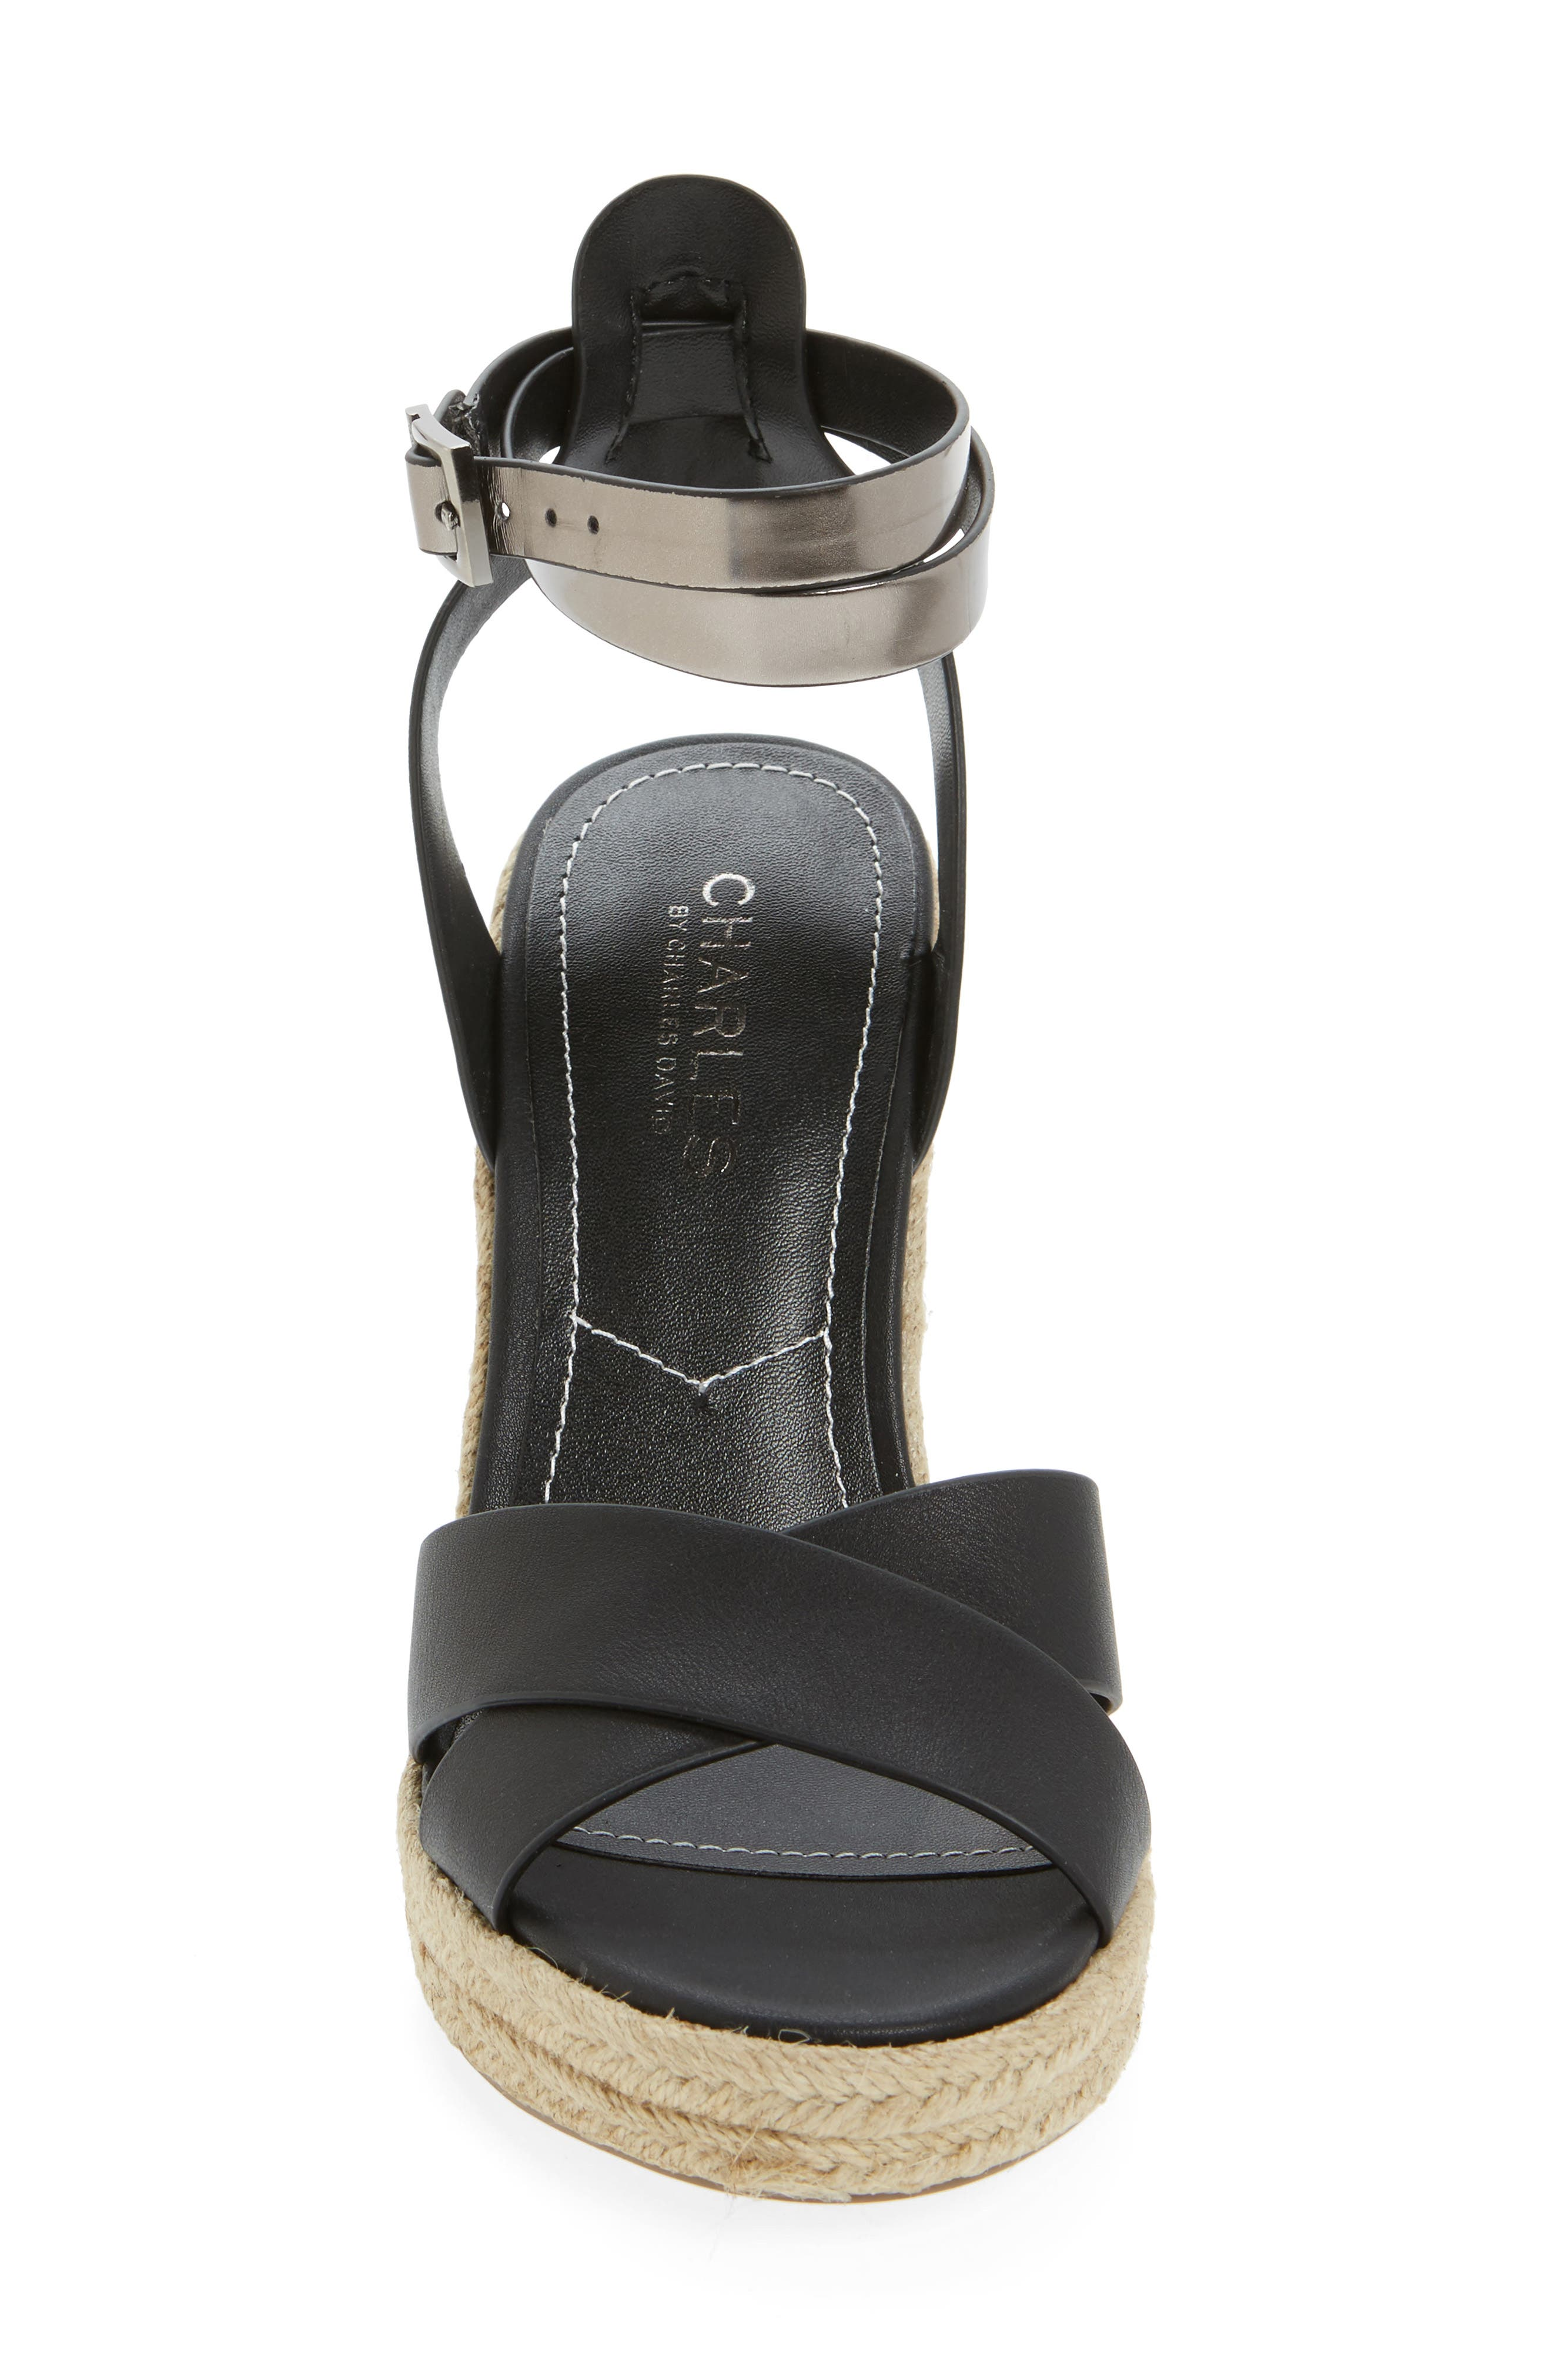 Brit Wedge Platform Sandal,                             Alternate thumbnail 3, color,                             Black/ Gunmetal